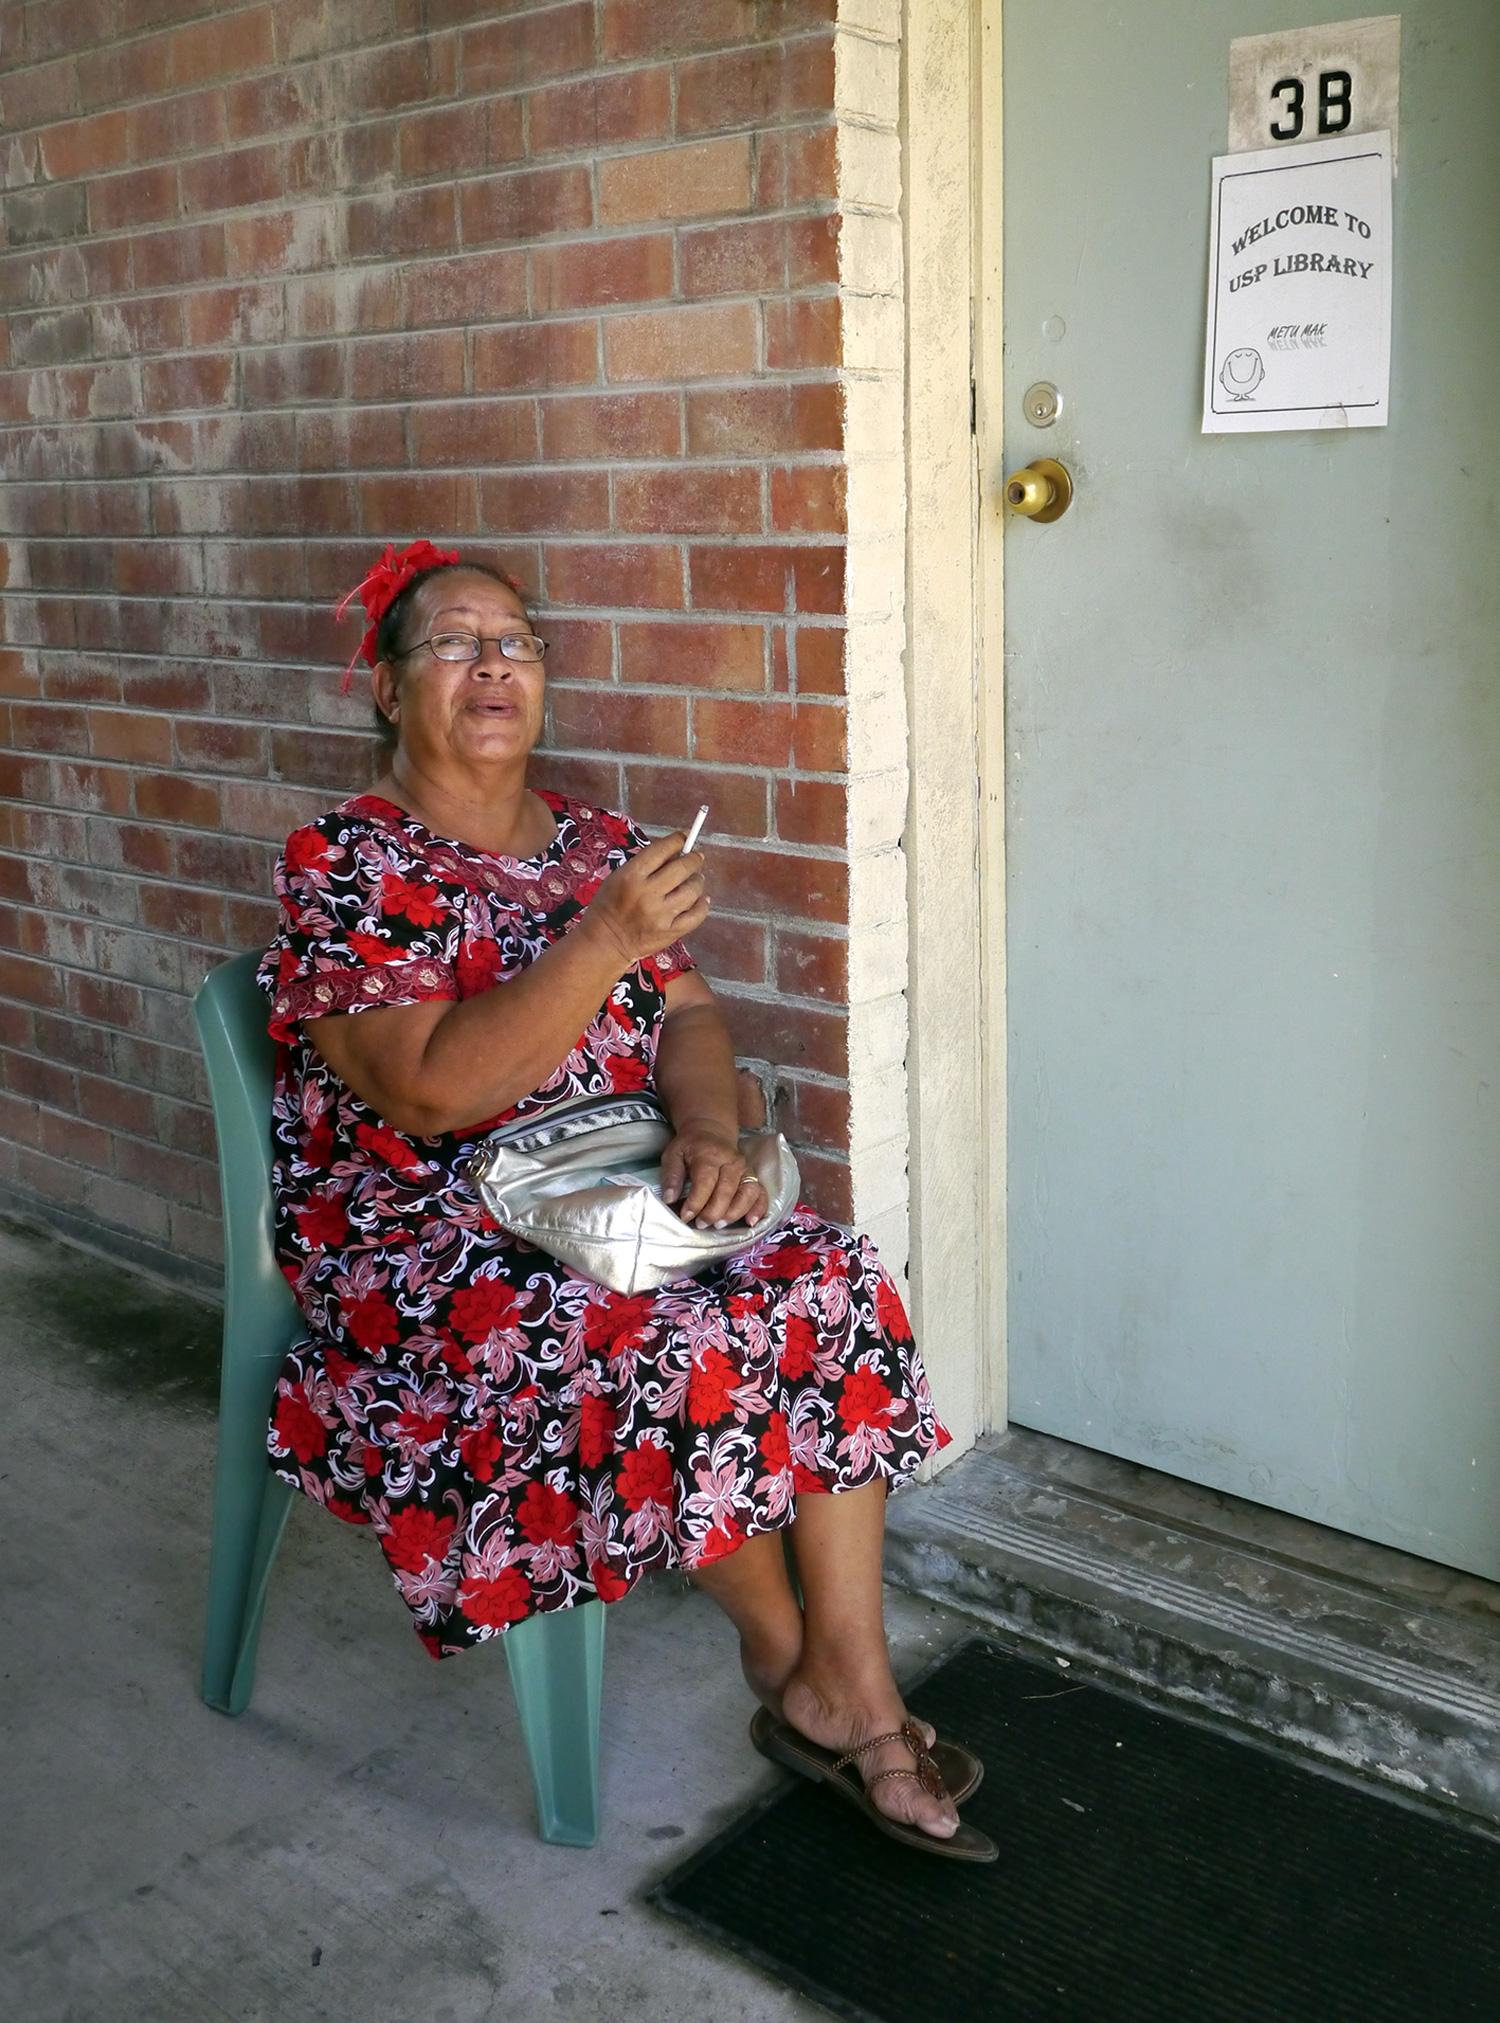 Briar-Rose-Alona-at-the-USP-Library,-Nauru.jpg